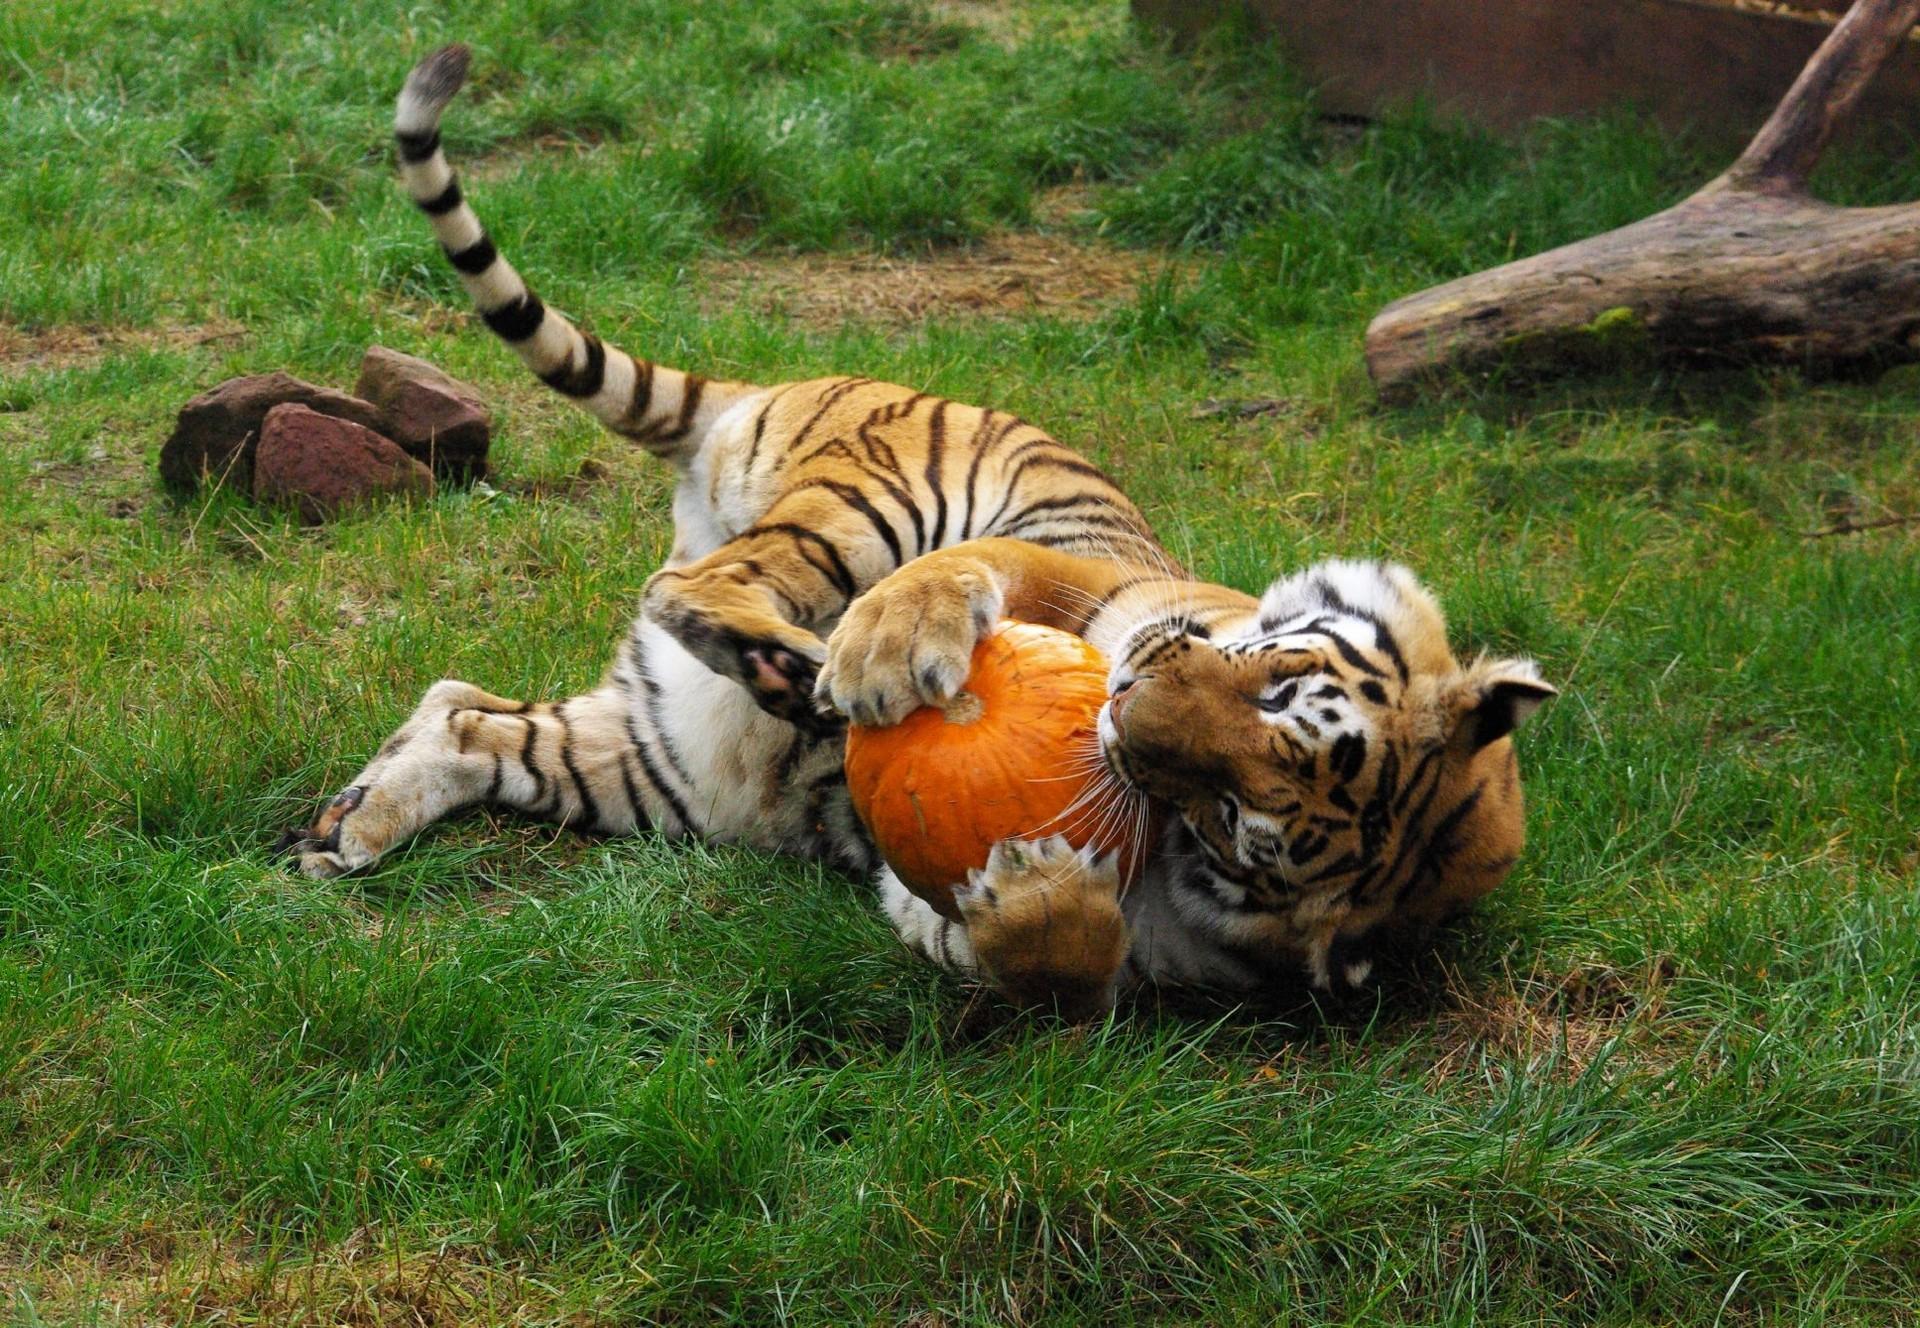 Un tigre en pleine séance de jeu